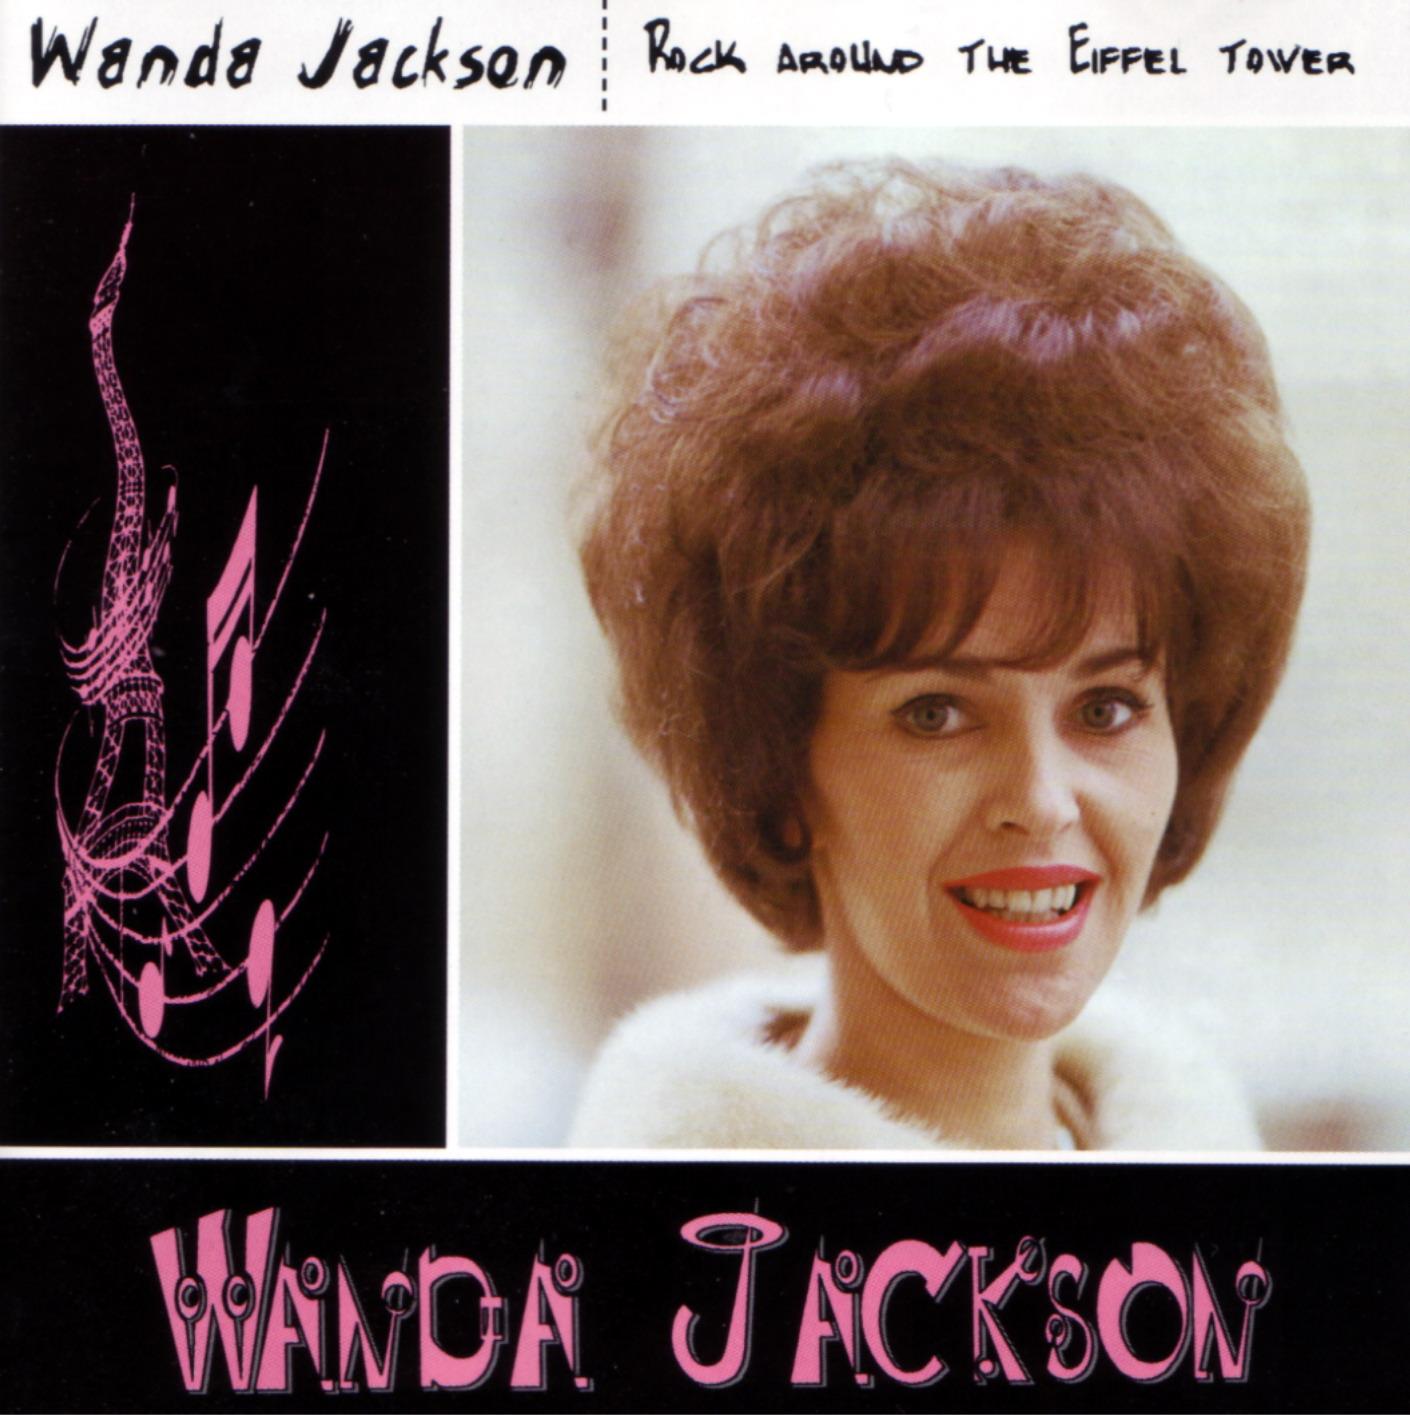 Rock On Wanda Jackson Rock Around The Eiffel Tower